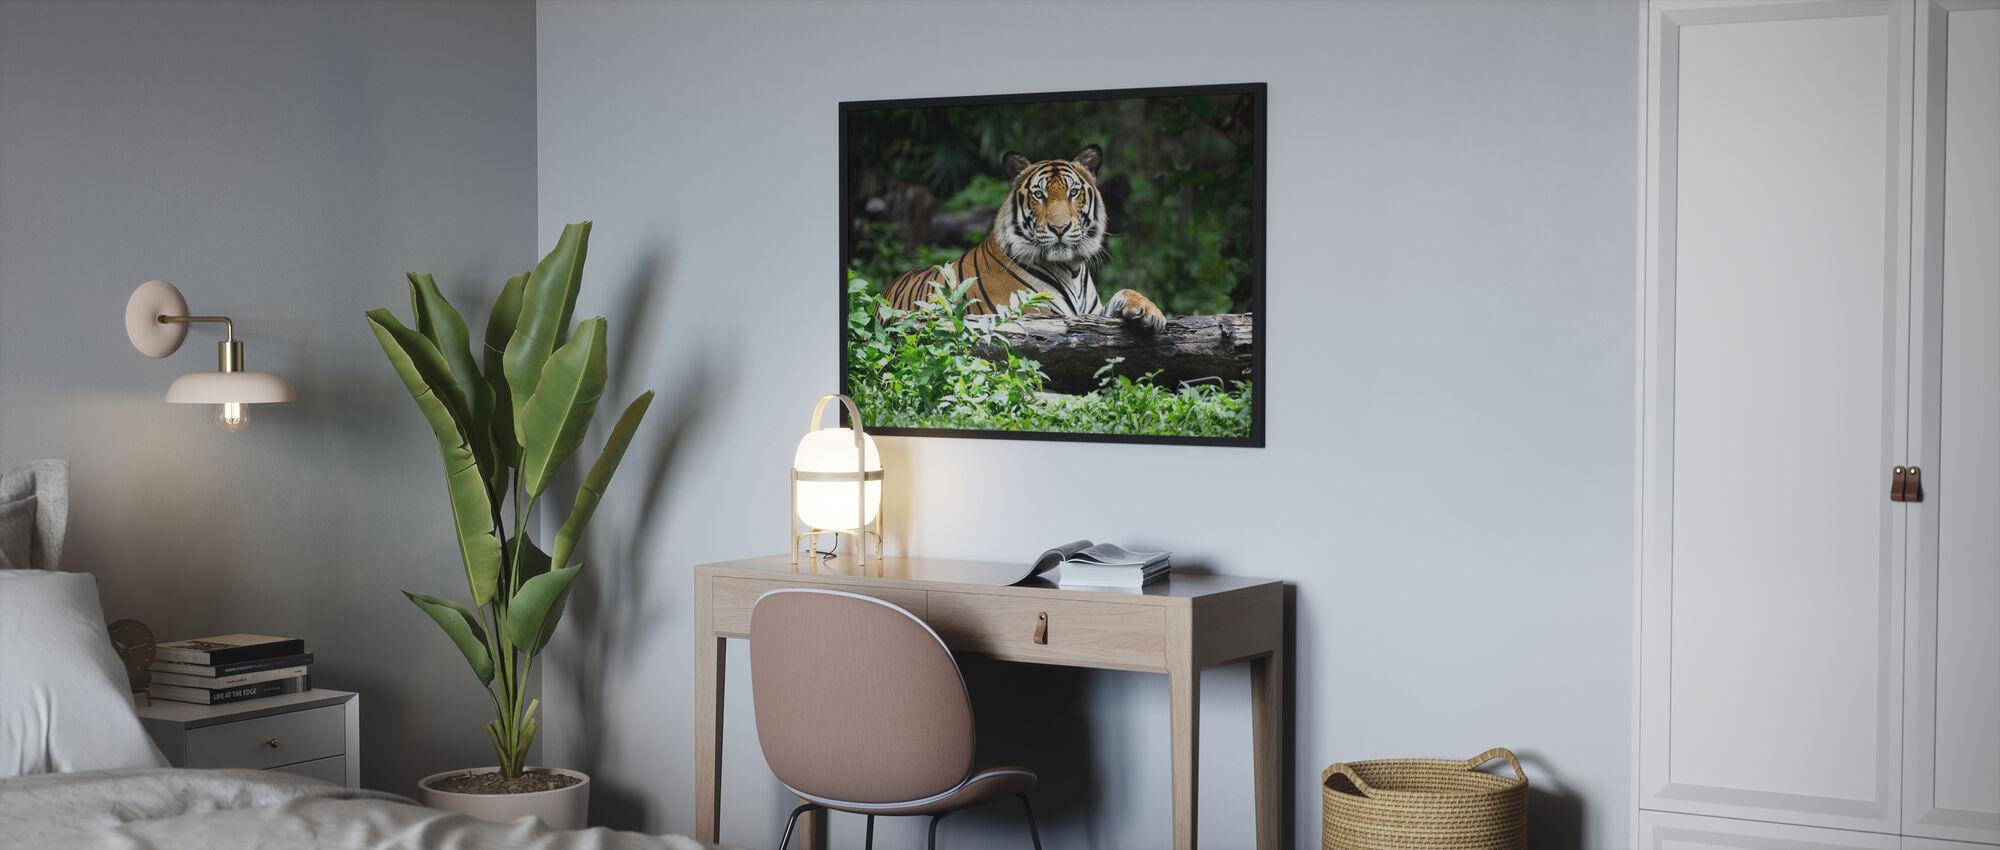 bengal tiger - Inramad tavla - Sovrum